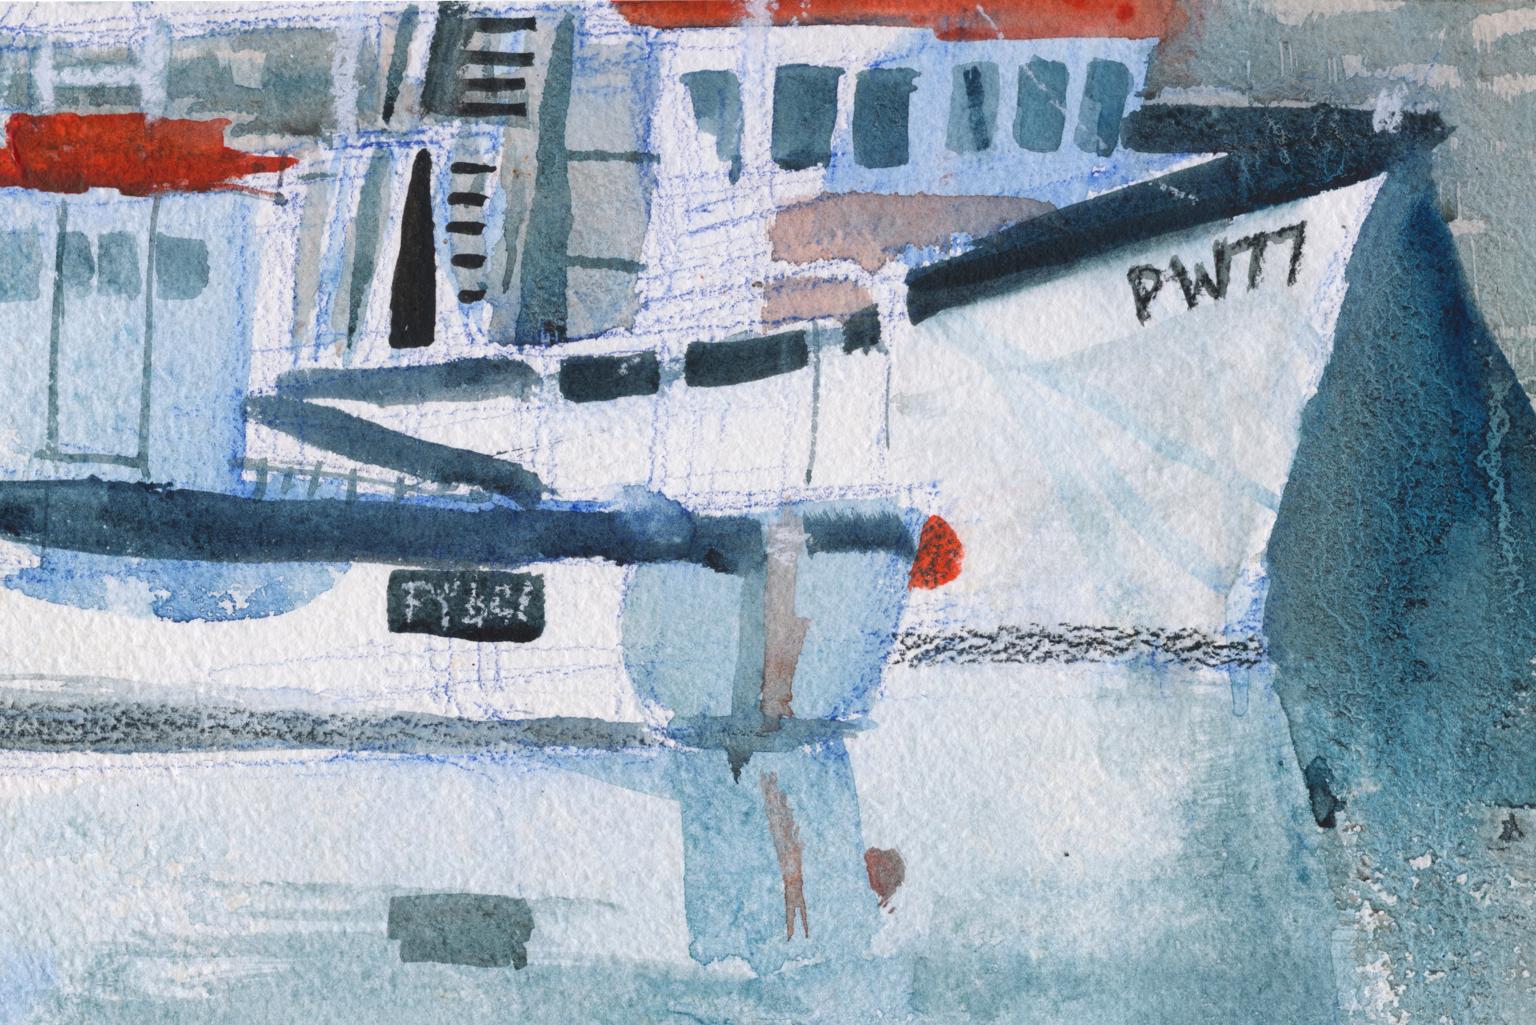 David Chandler CW-trawlers